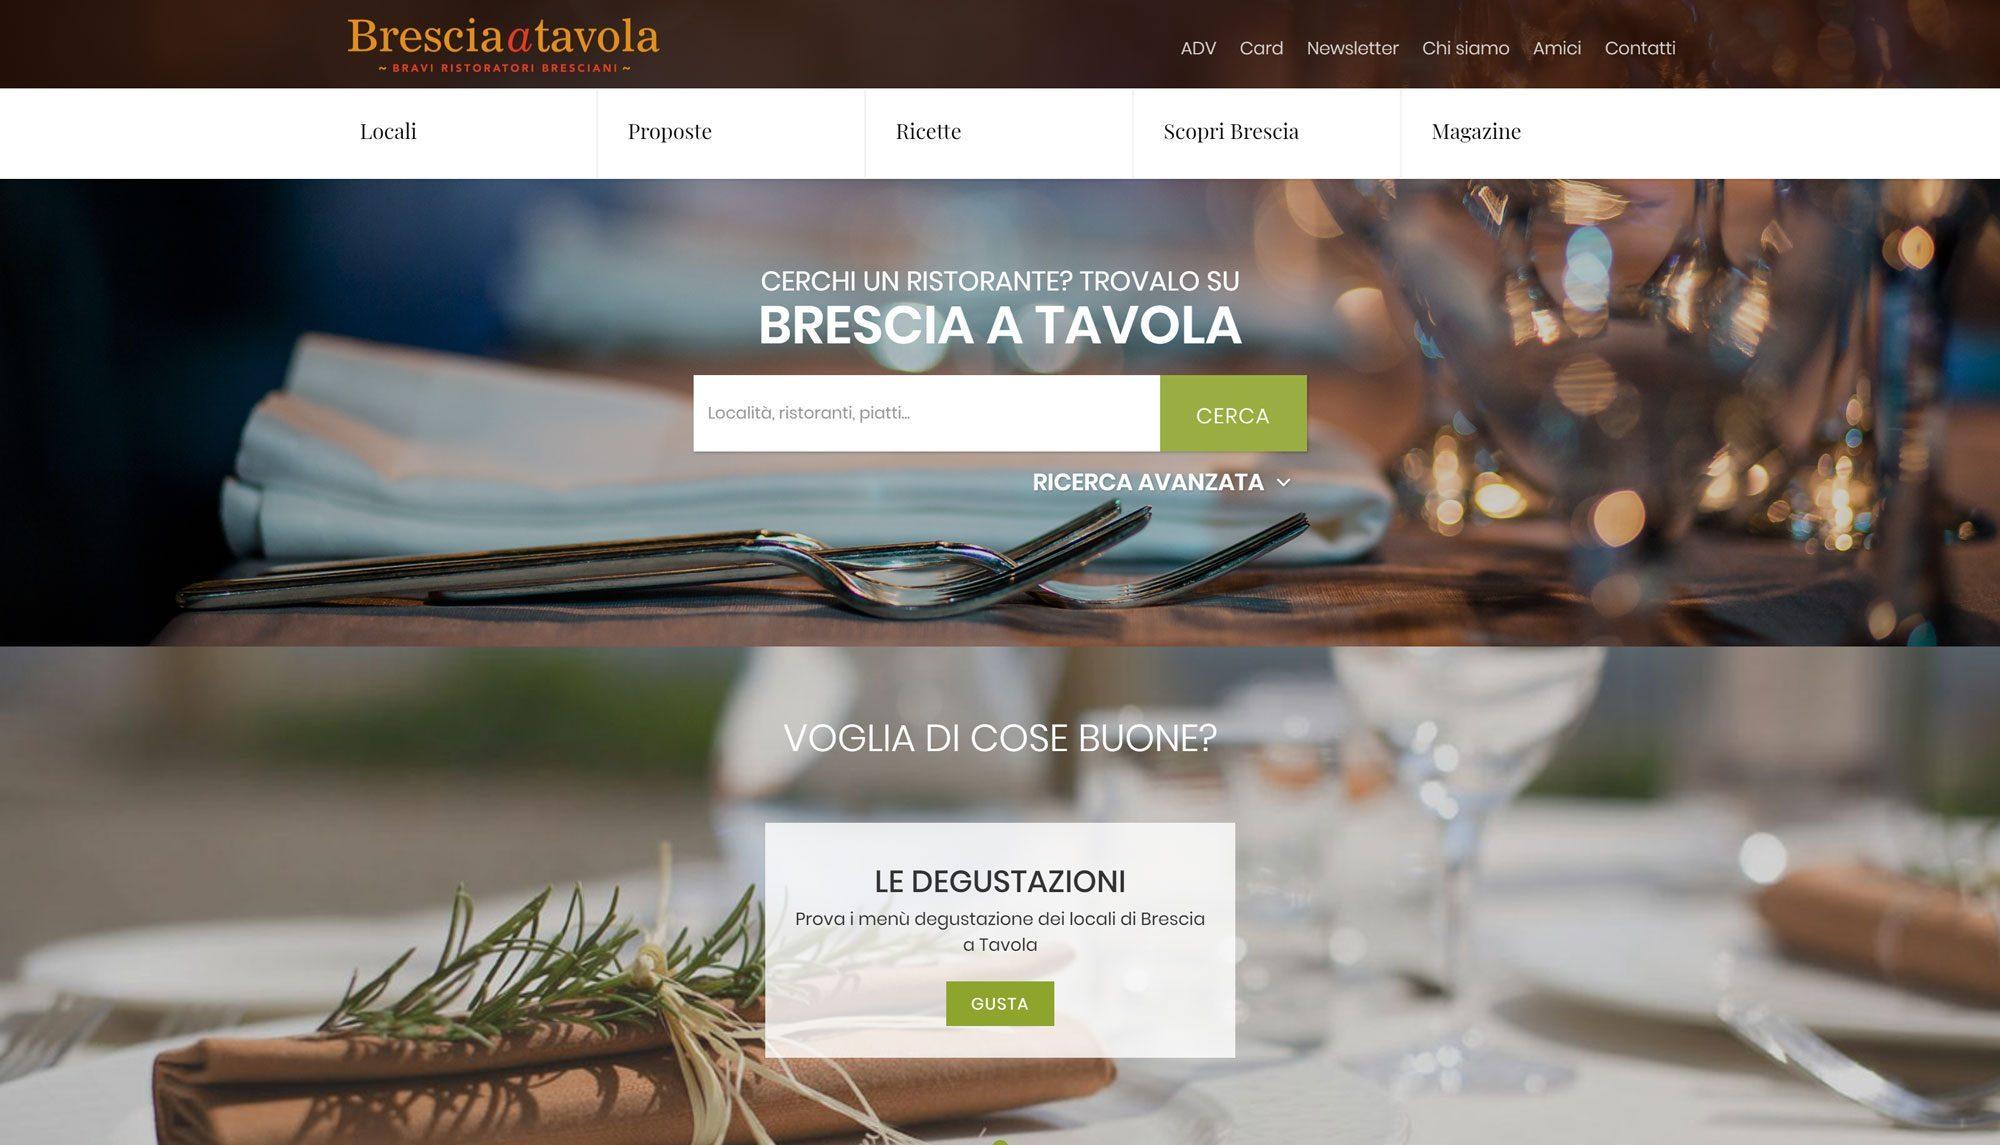 Brescia a Tavola